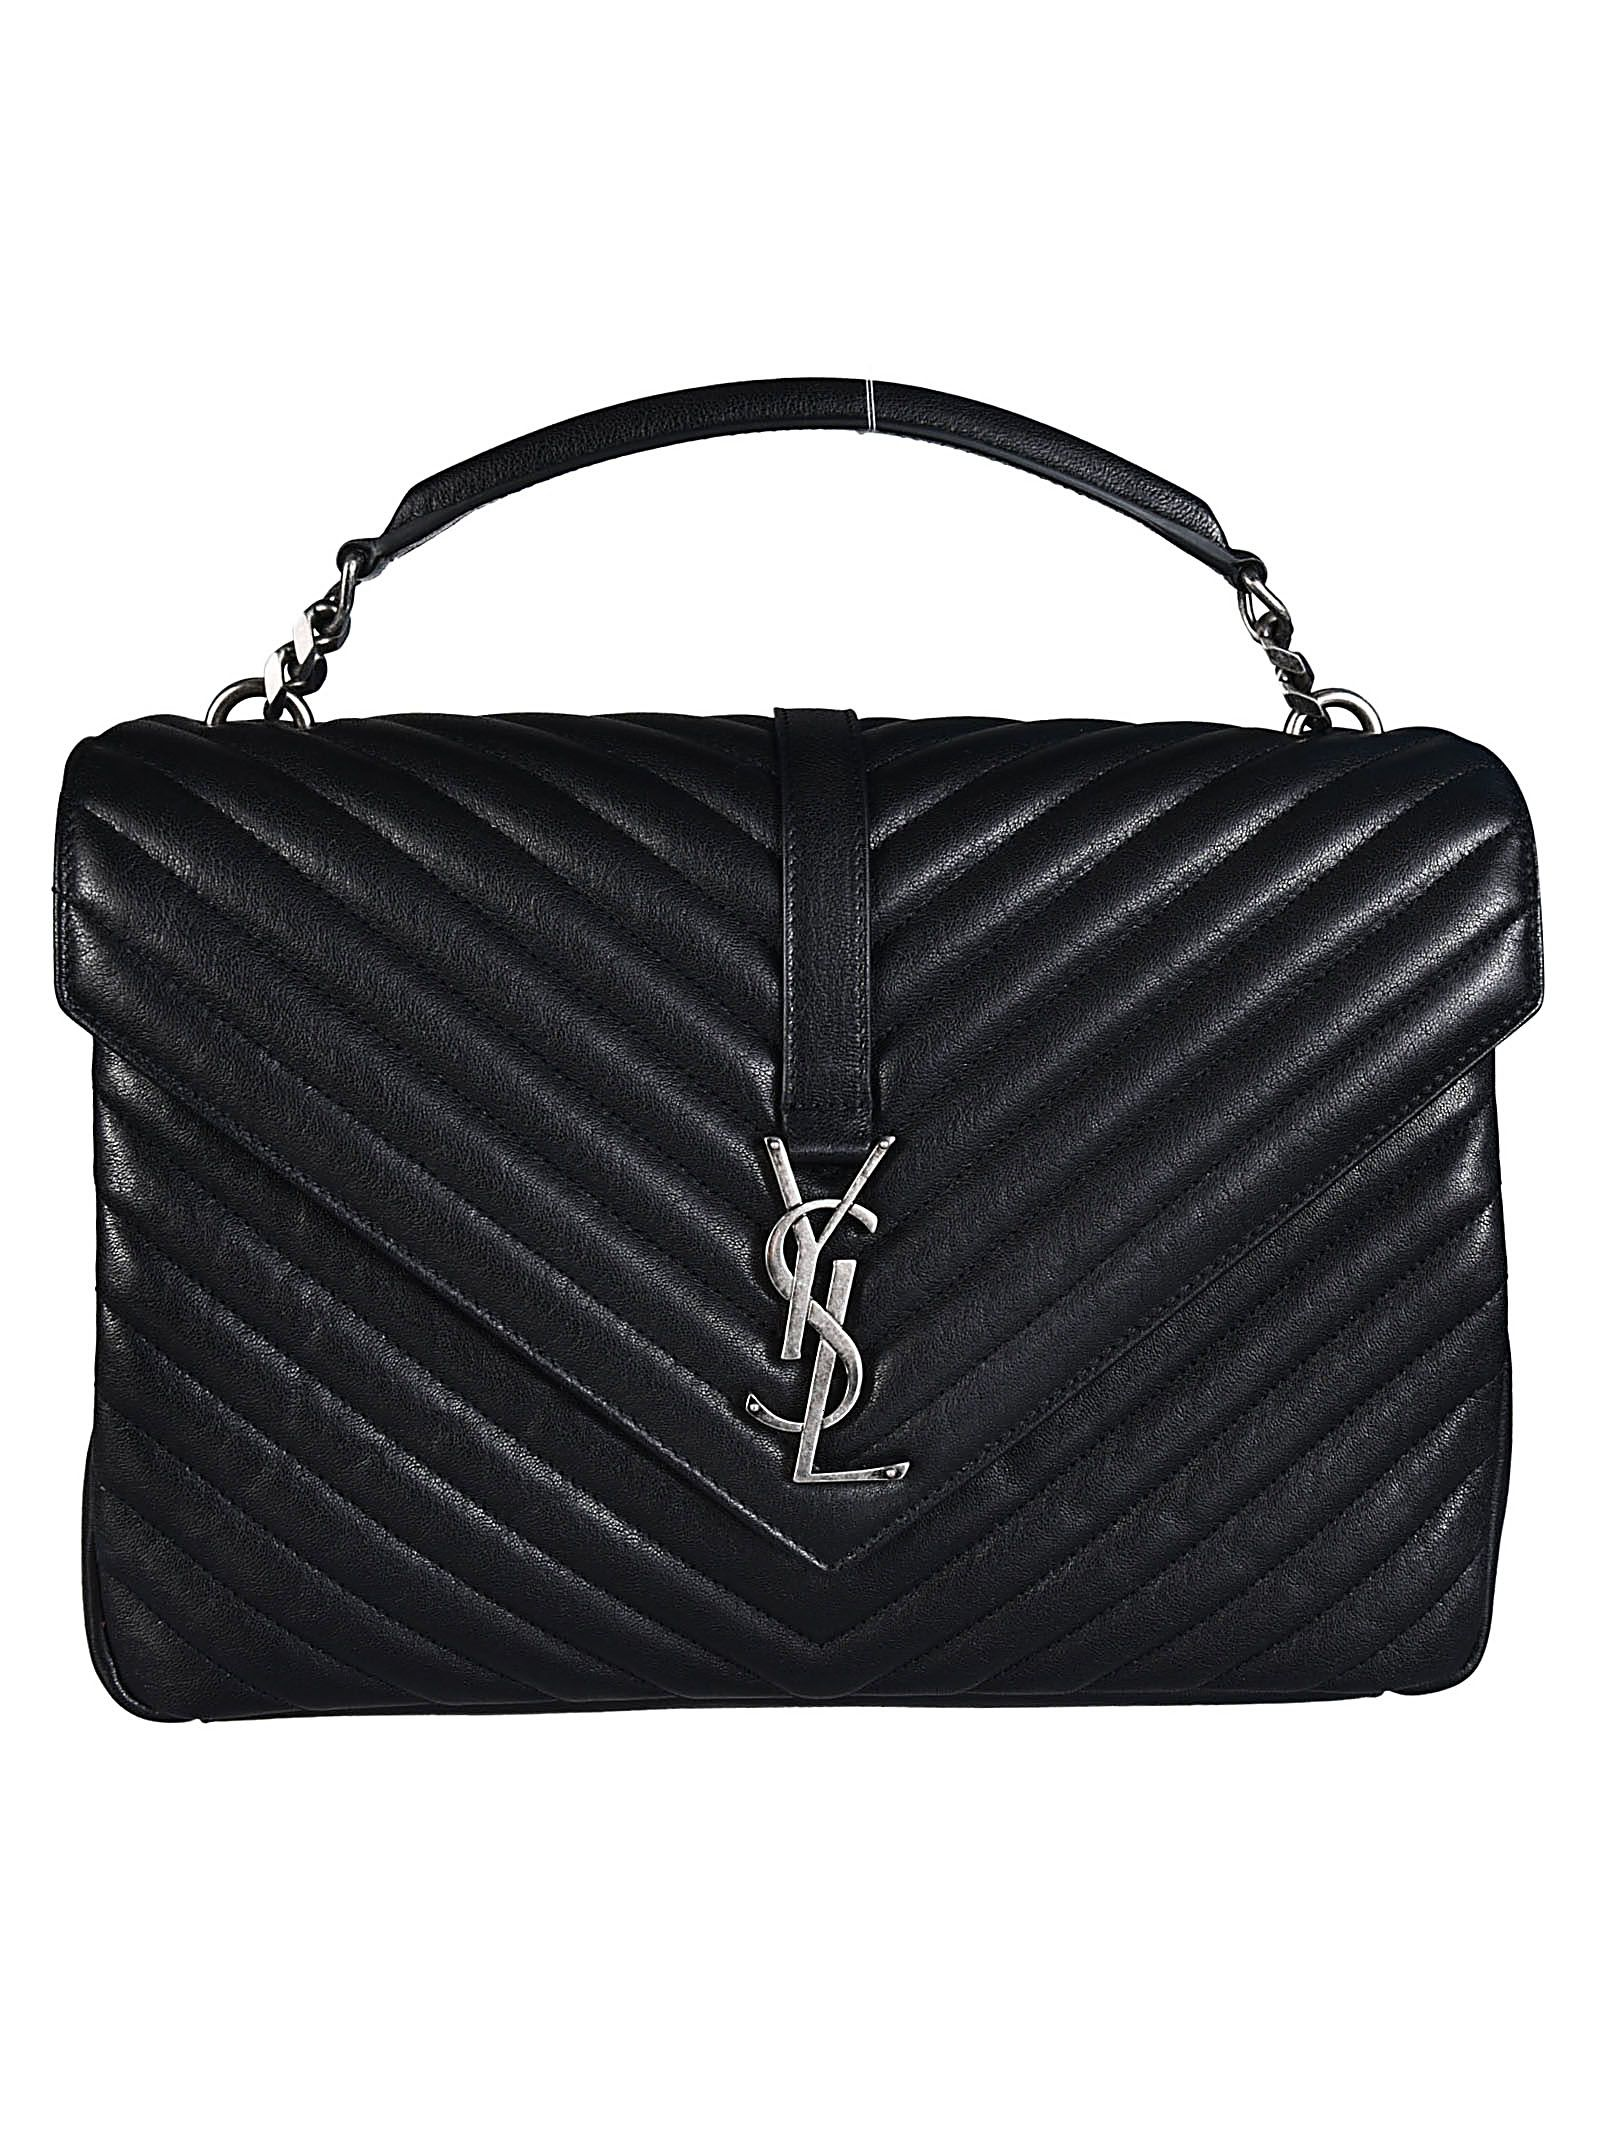 9c6276e4d5 Saint Laurent Saint Laurent Medium College Monogram Shoulder Bag ...